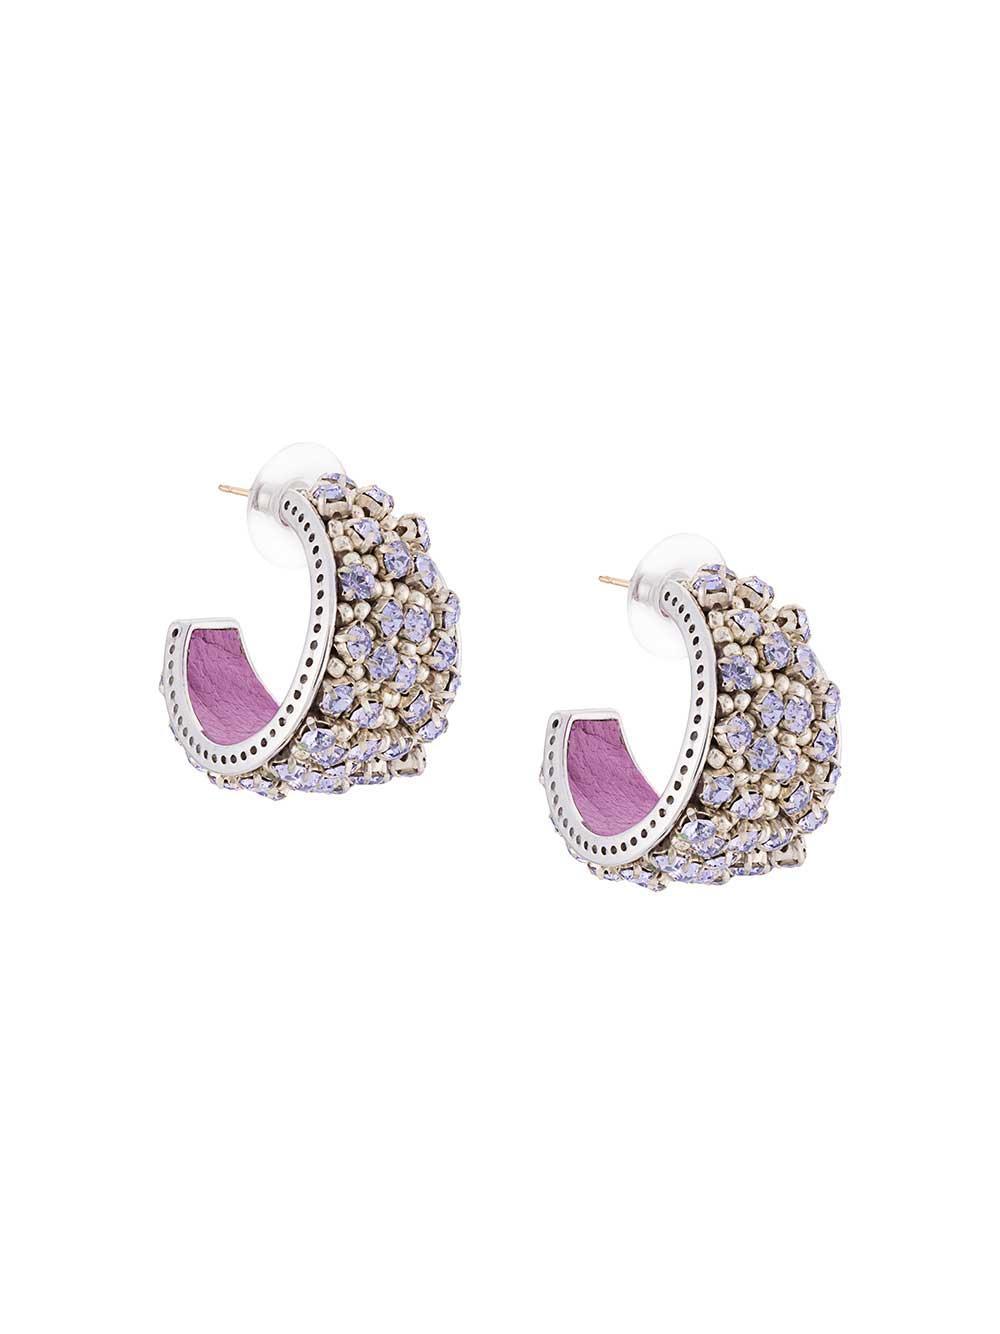 Kaya Huggie Earrings Item # E304-P001